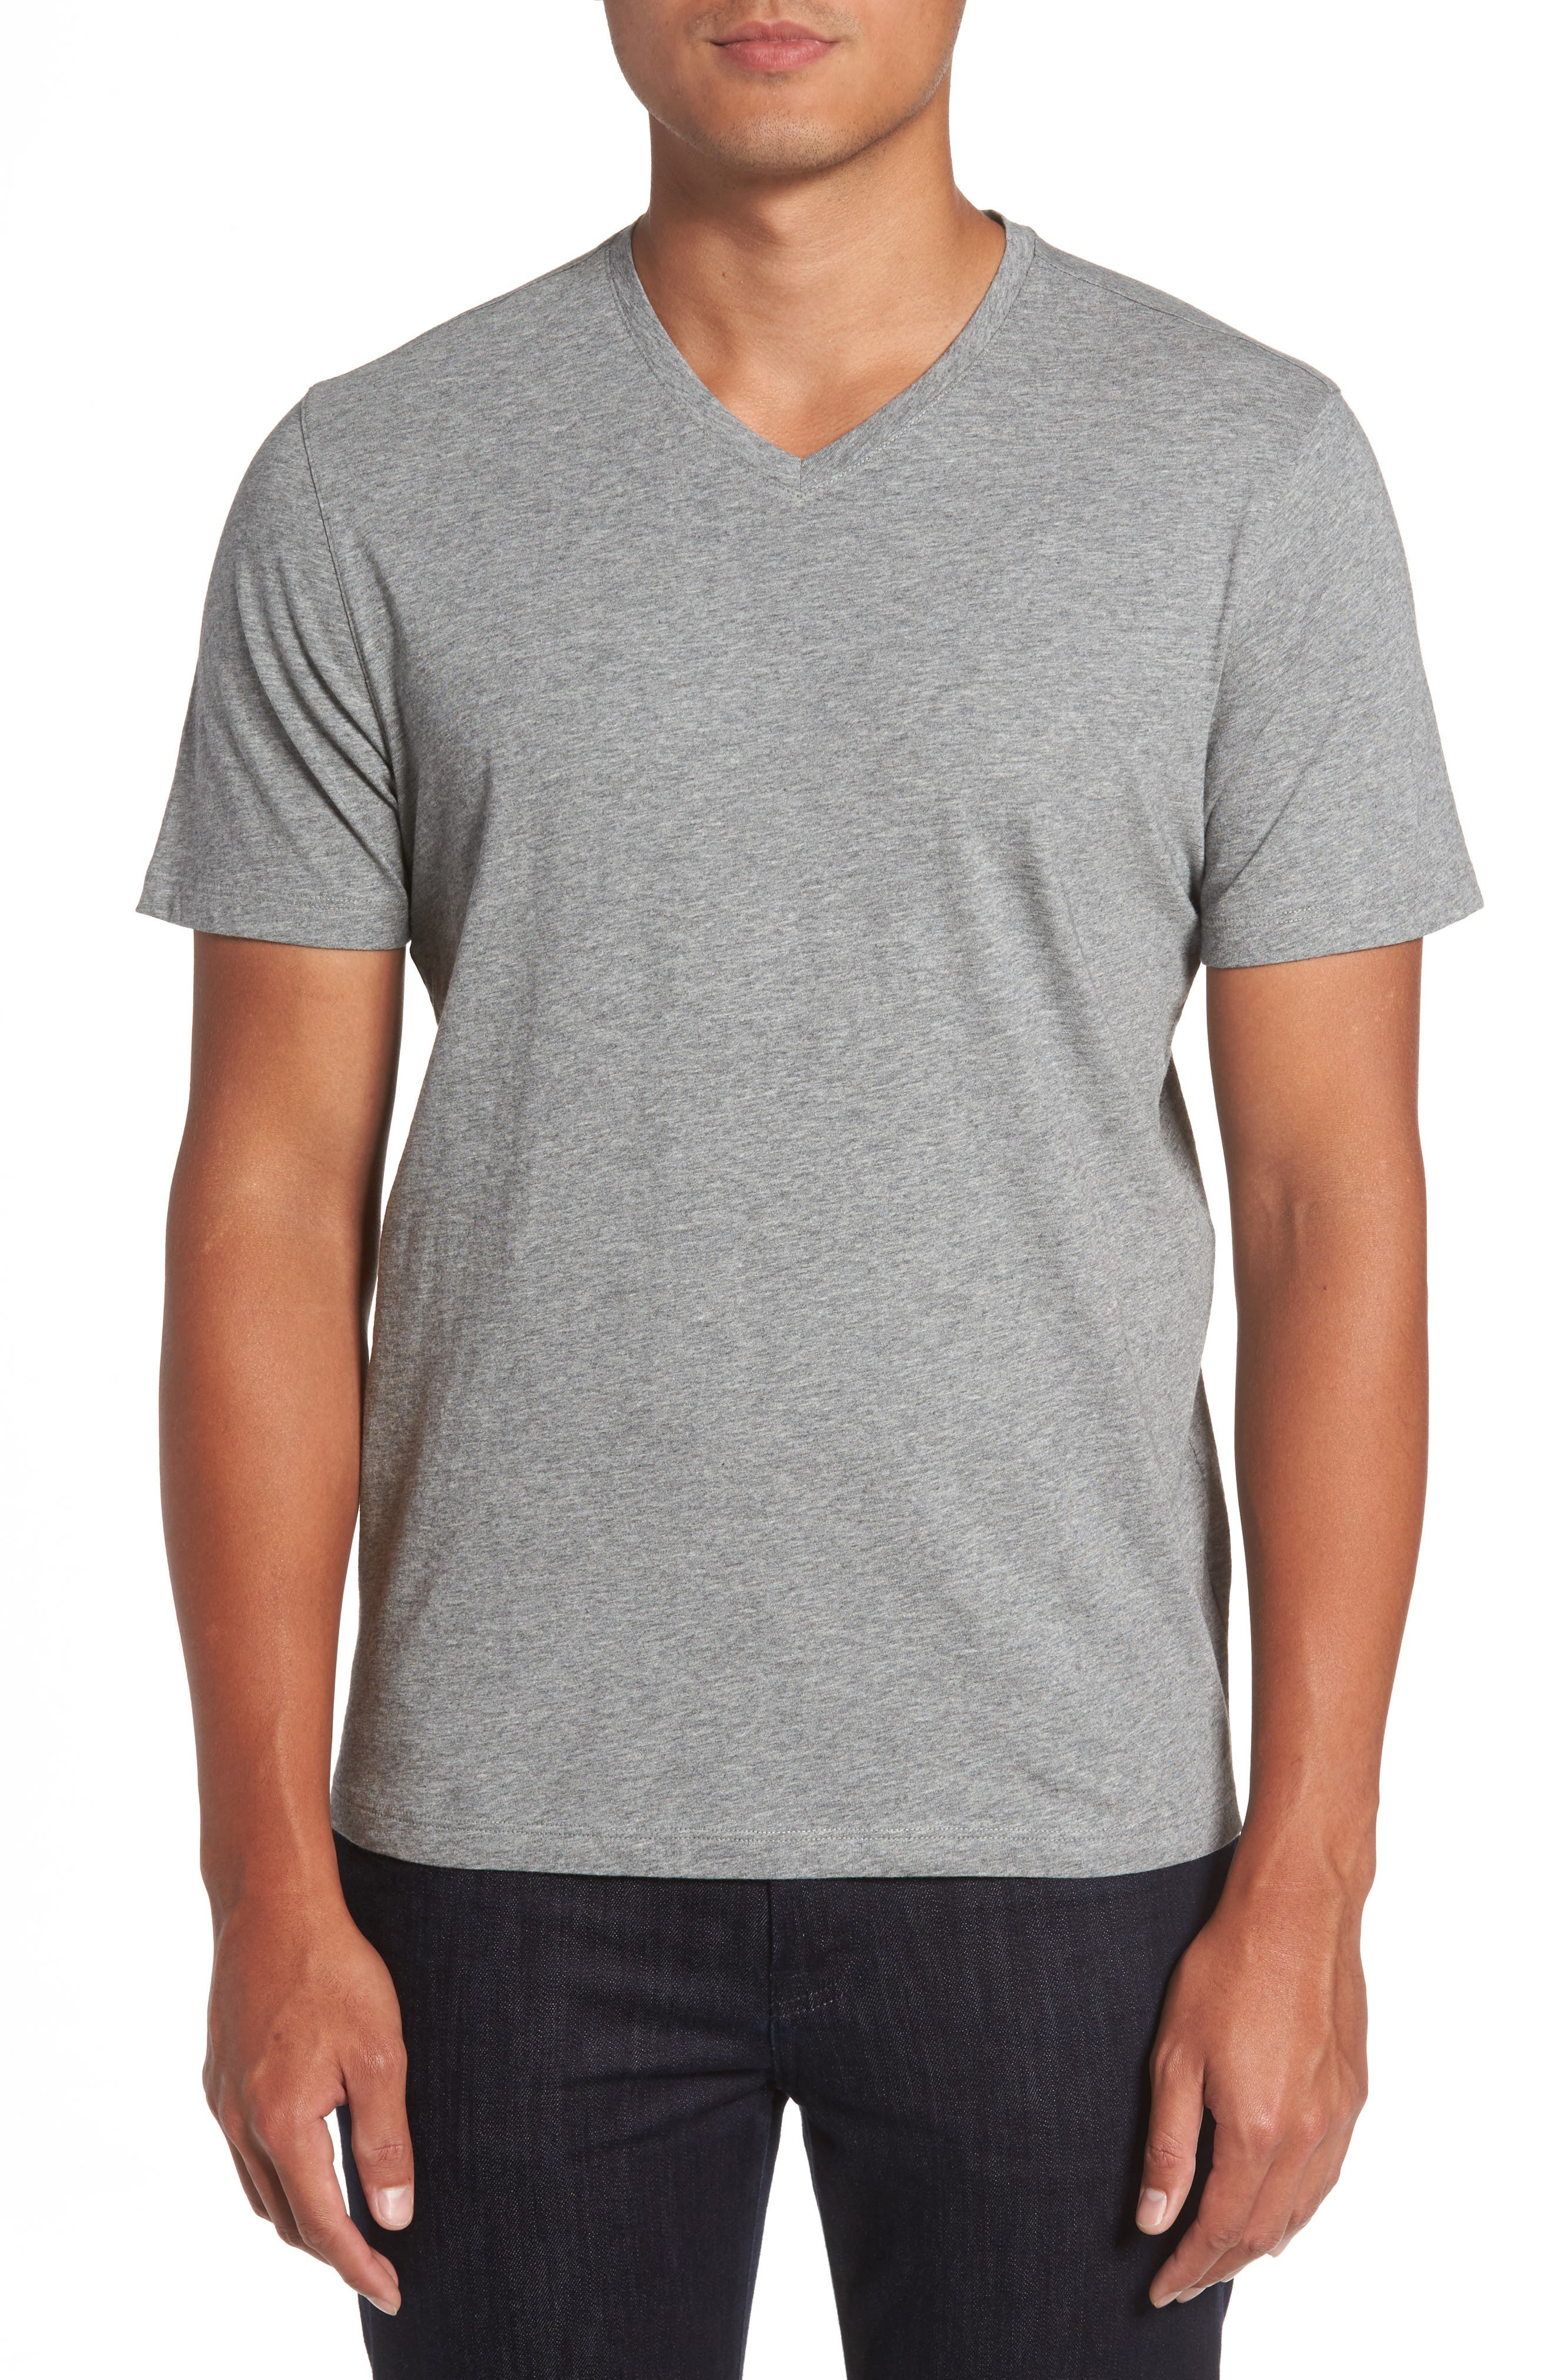 Main Image - Zachary Prell Mercer V-Neck T-Shirt